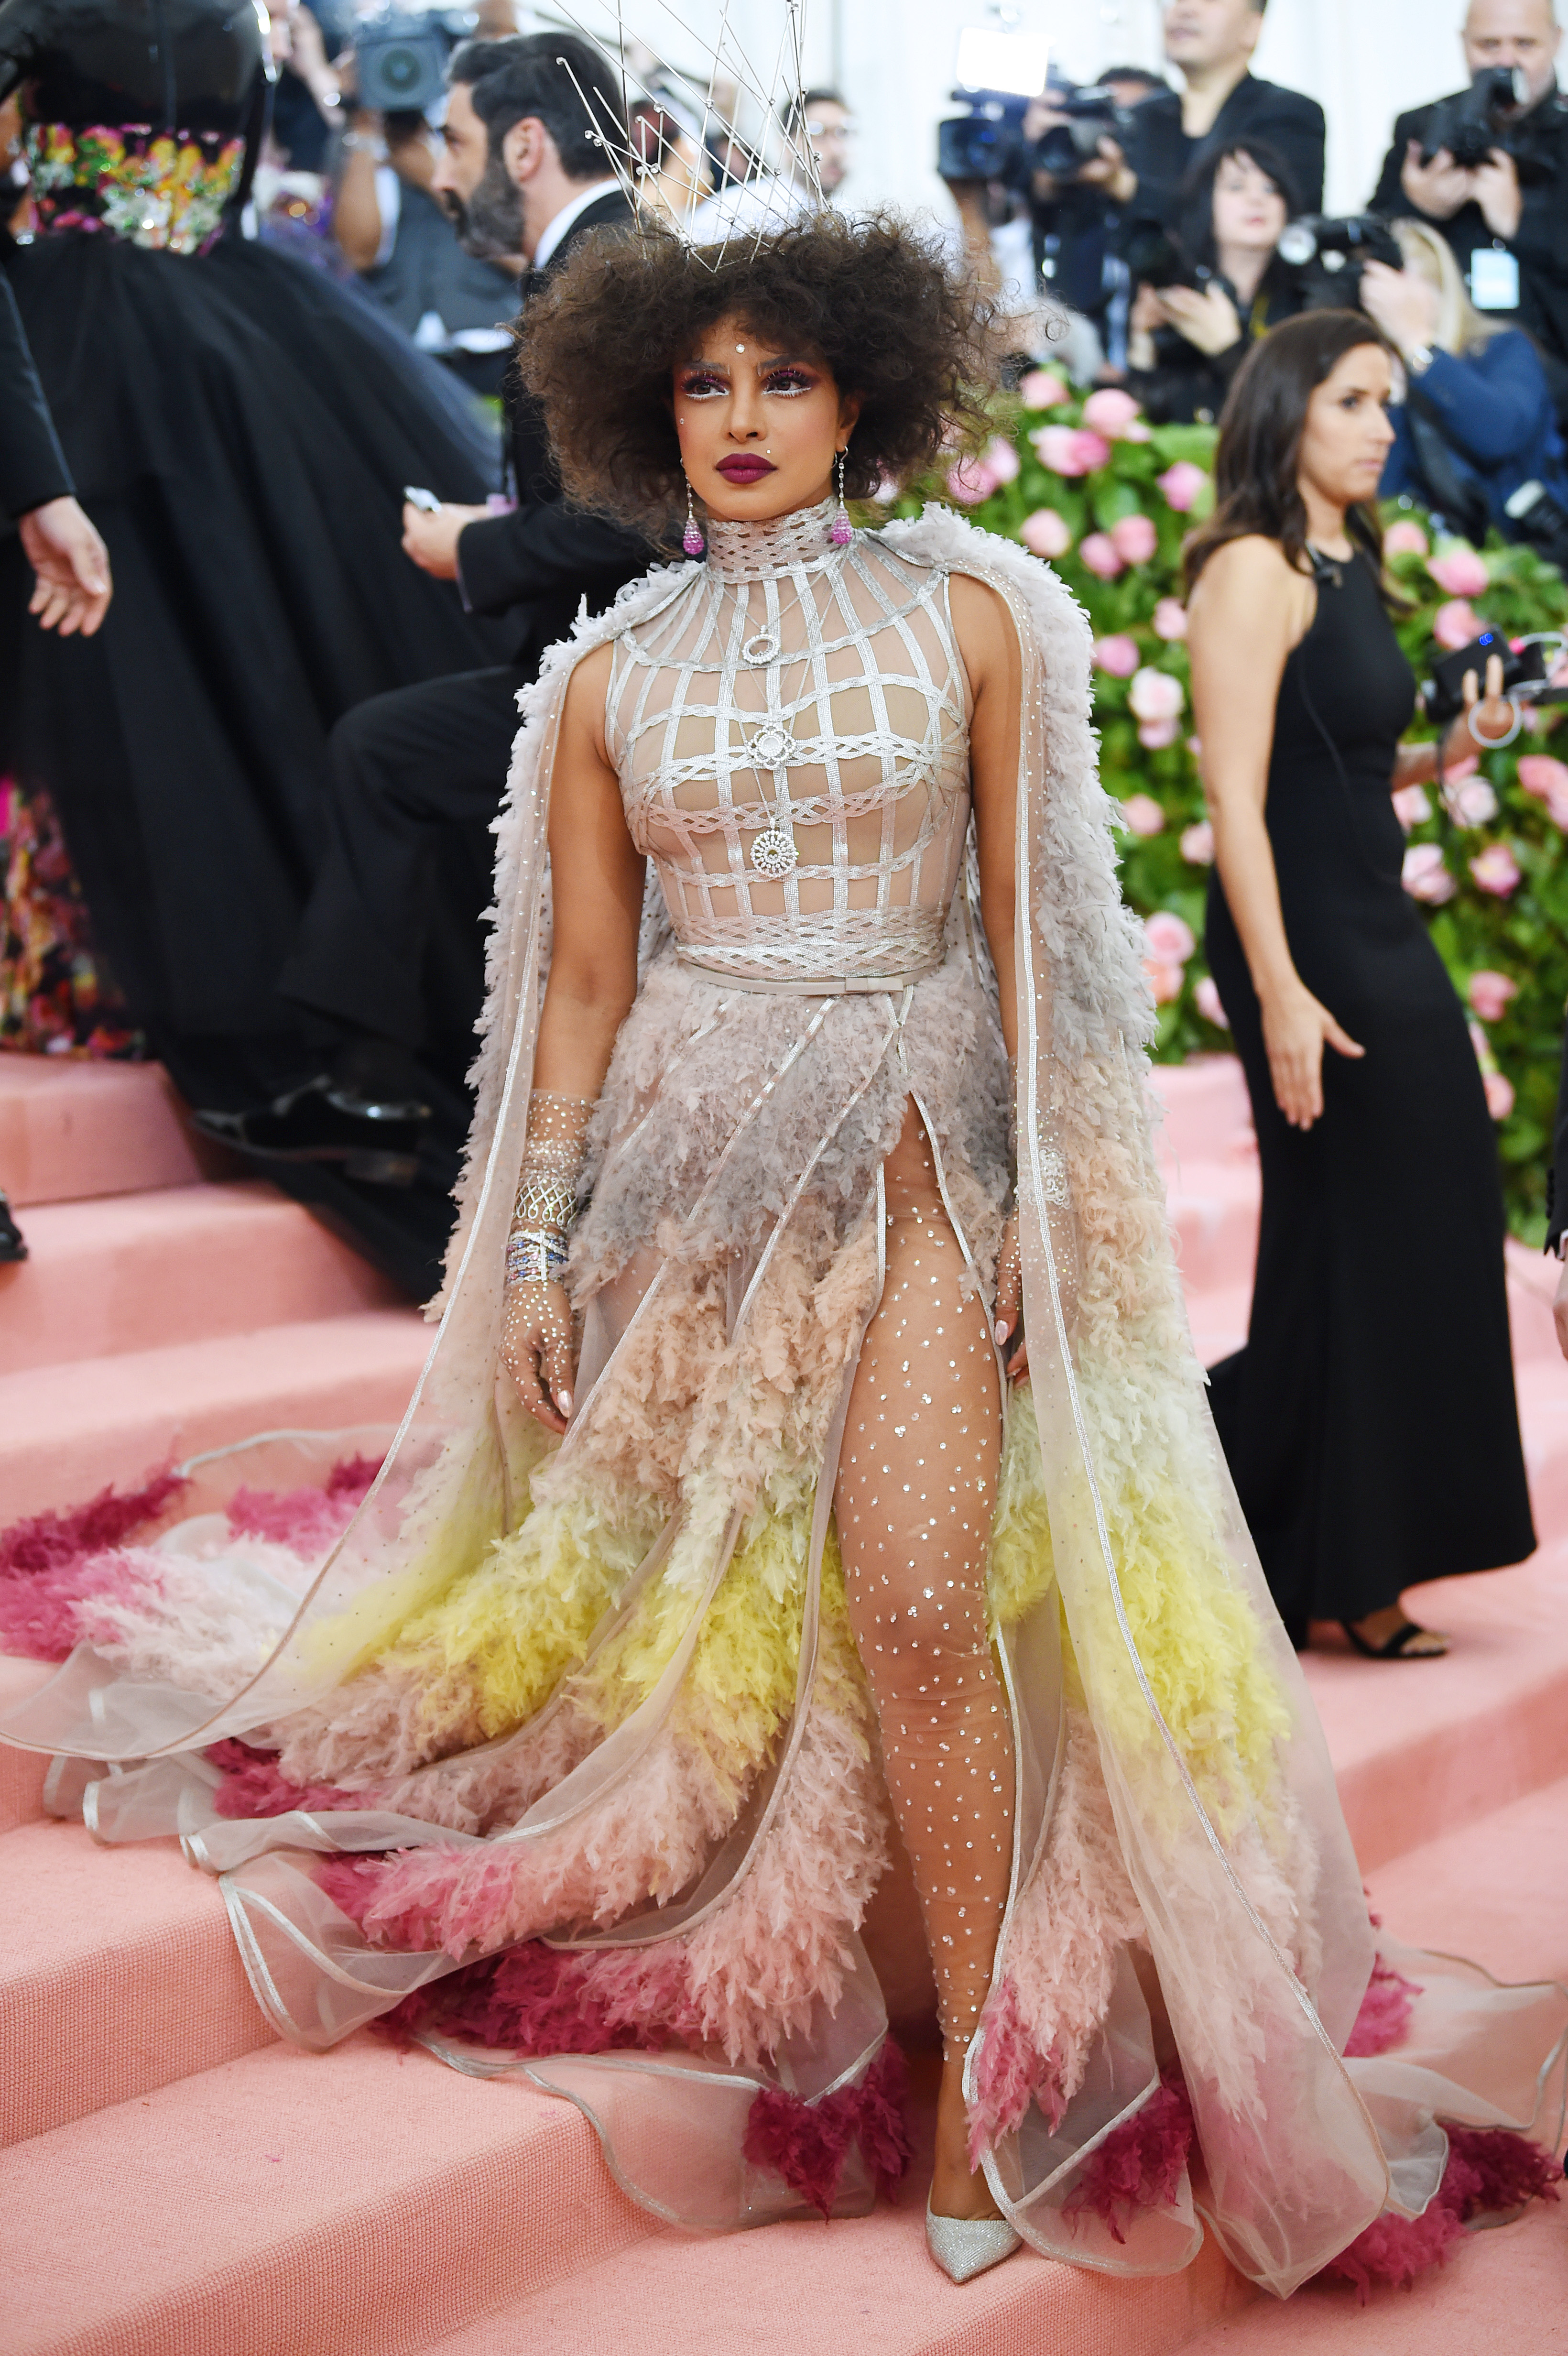 Priyanka Chopra S Bold Fashion Has Made Her A Global Style Icon Cnn Style